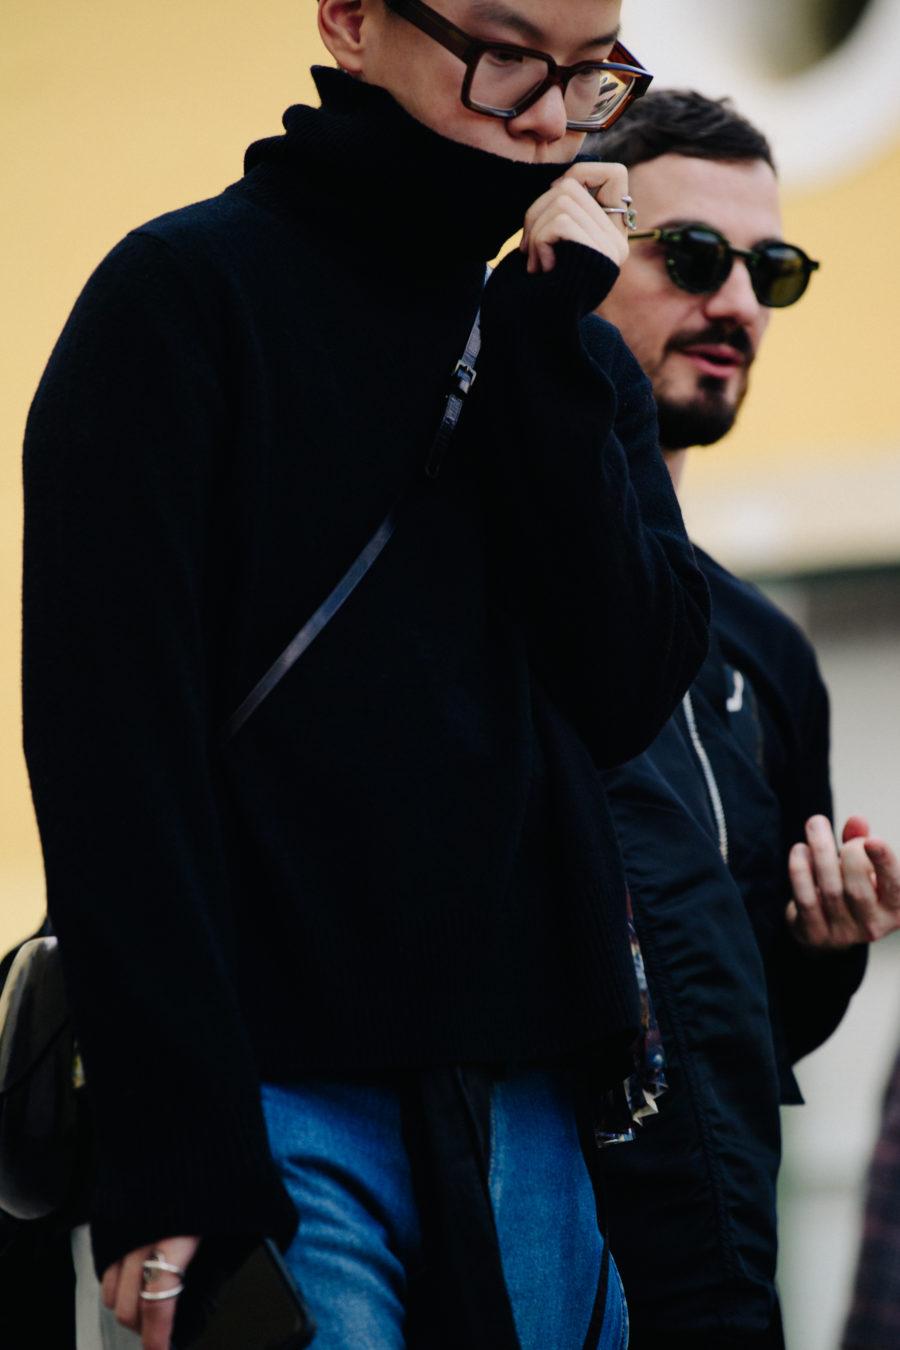 Man wearing black jumper